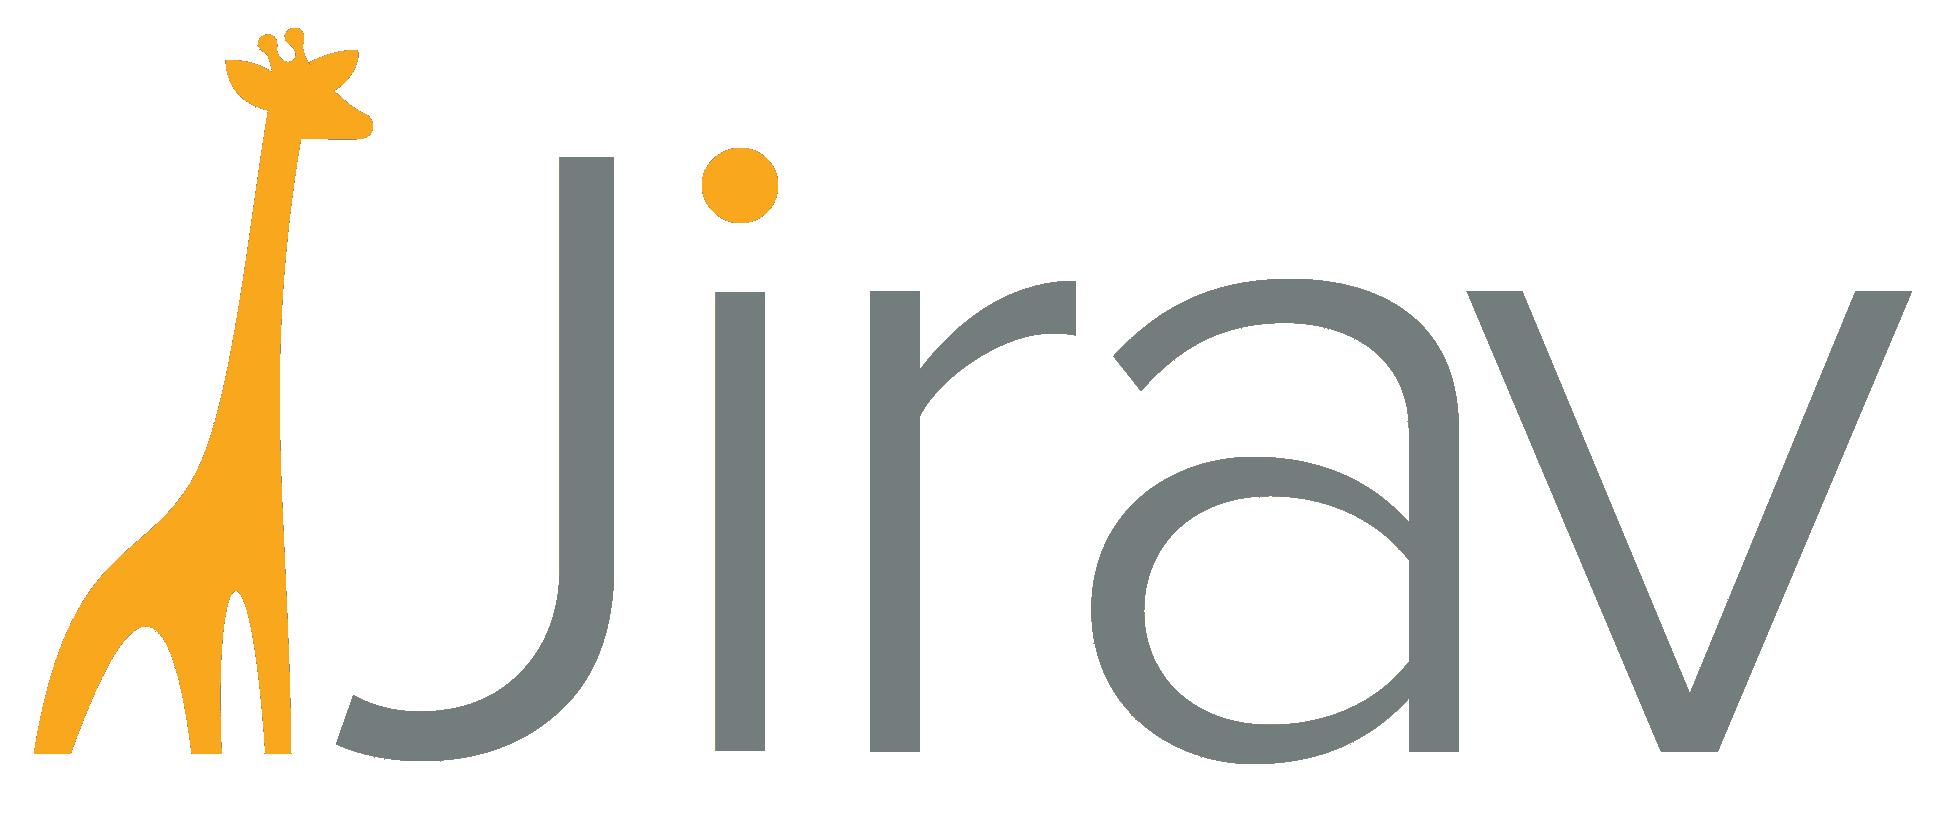 Fintech startup Jirav raises $8.3M for financial planning and analysis software